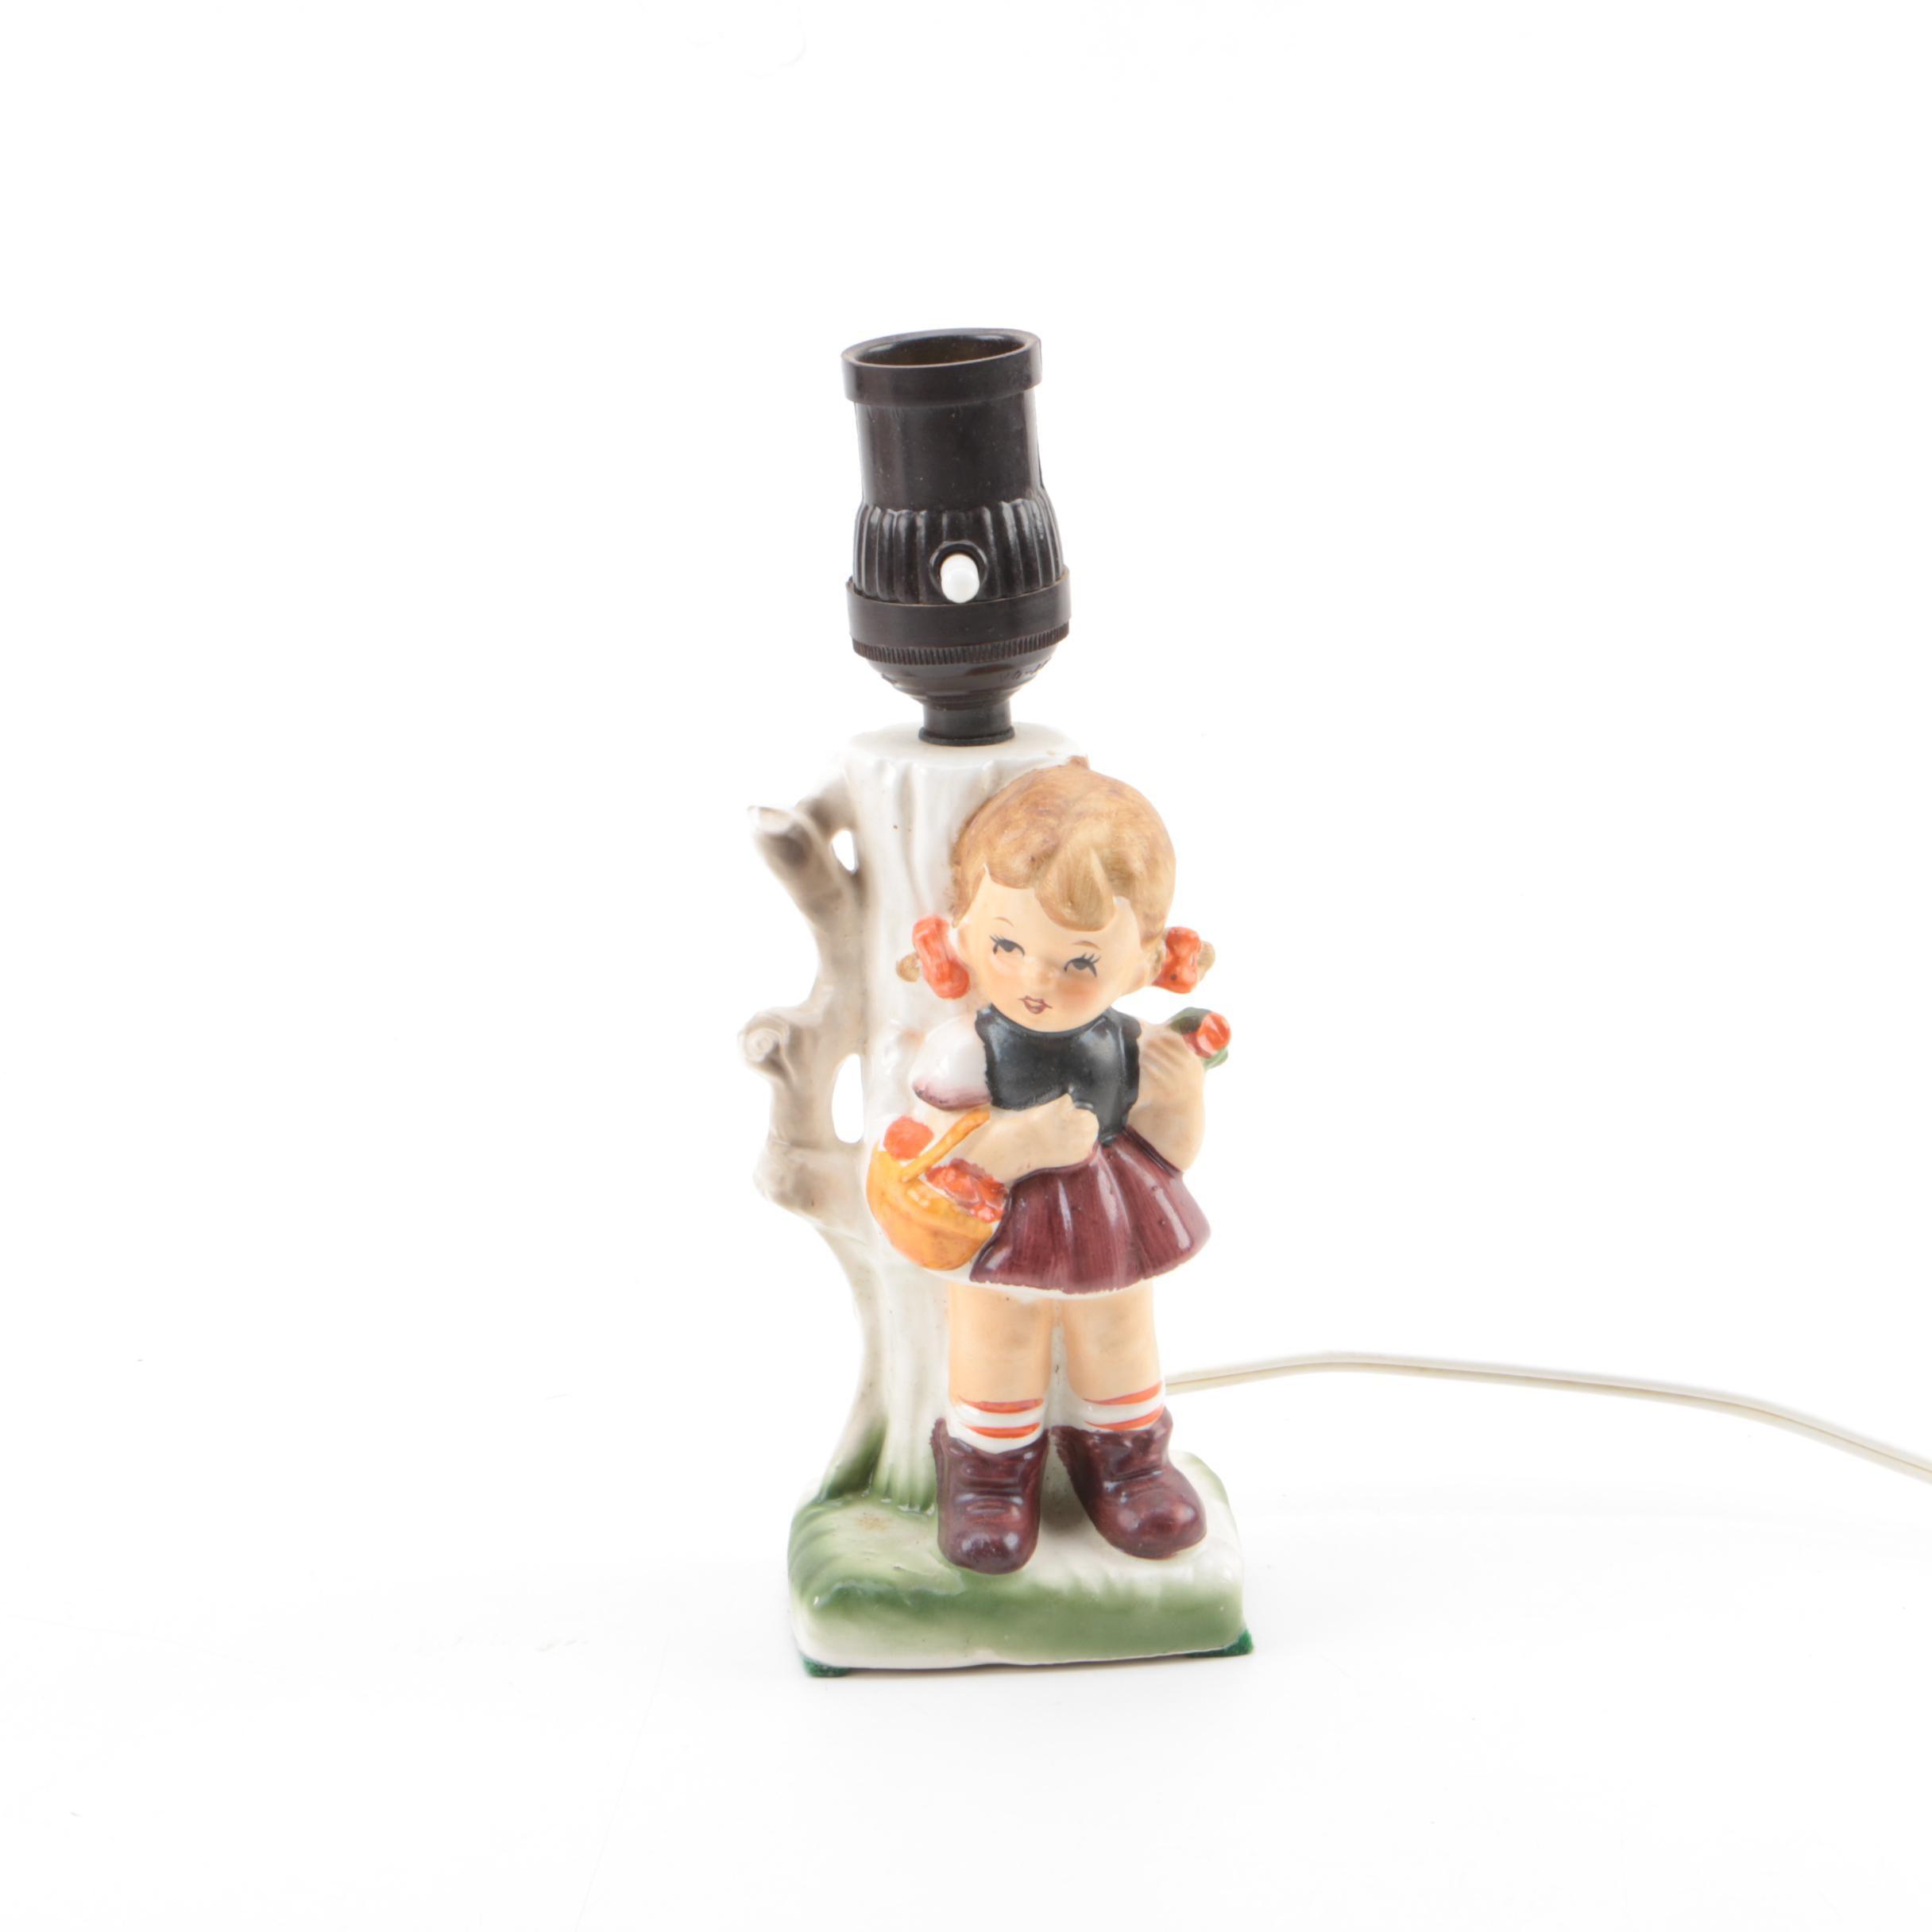 Vintage Figural Ceramic Hummel-Style Table Lamp